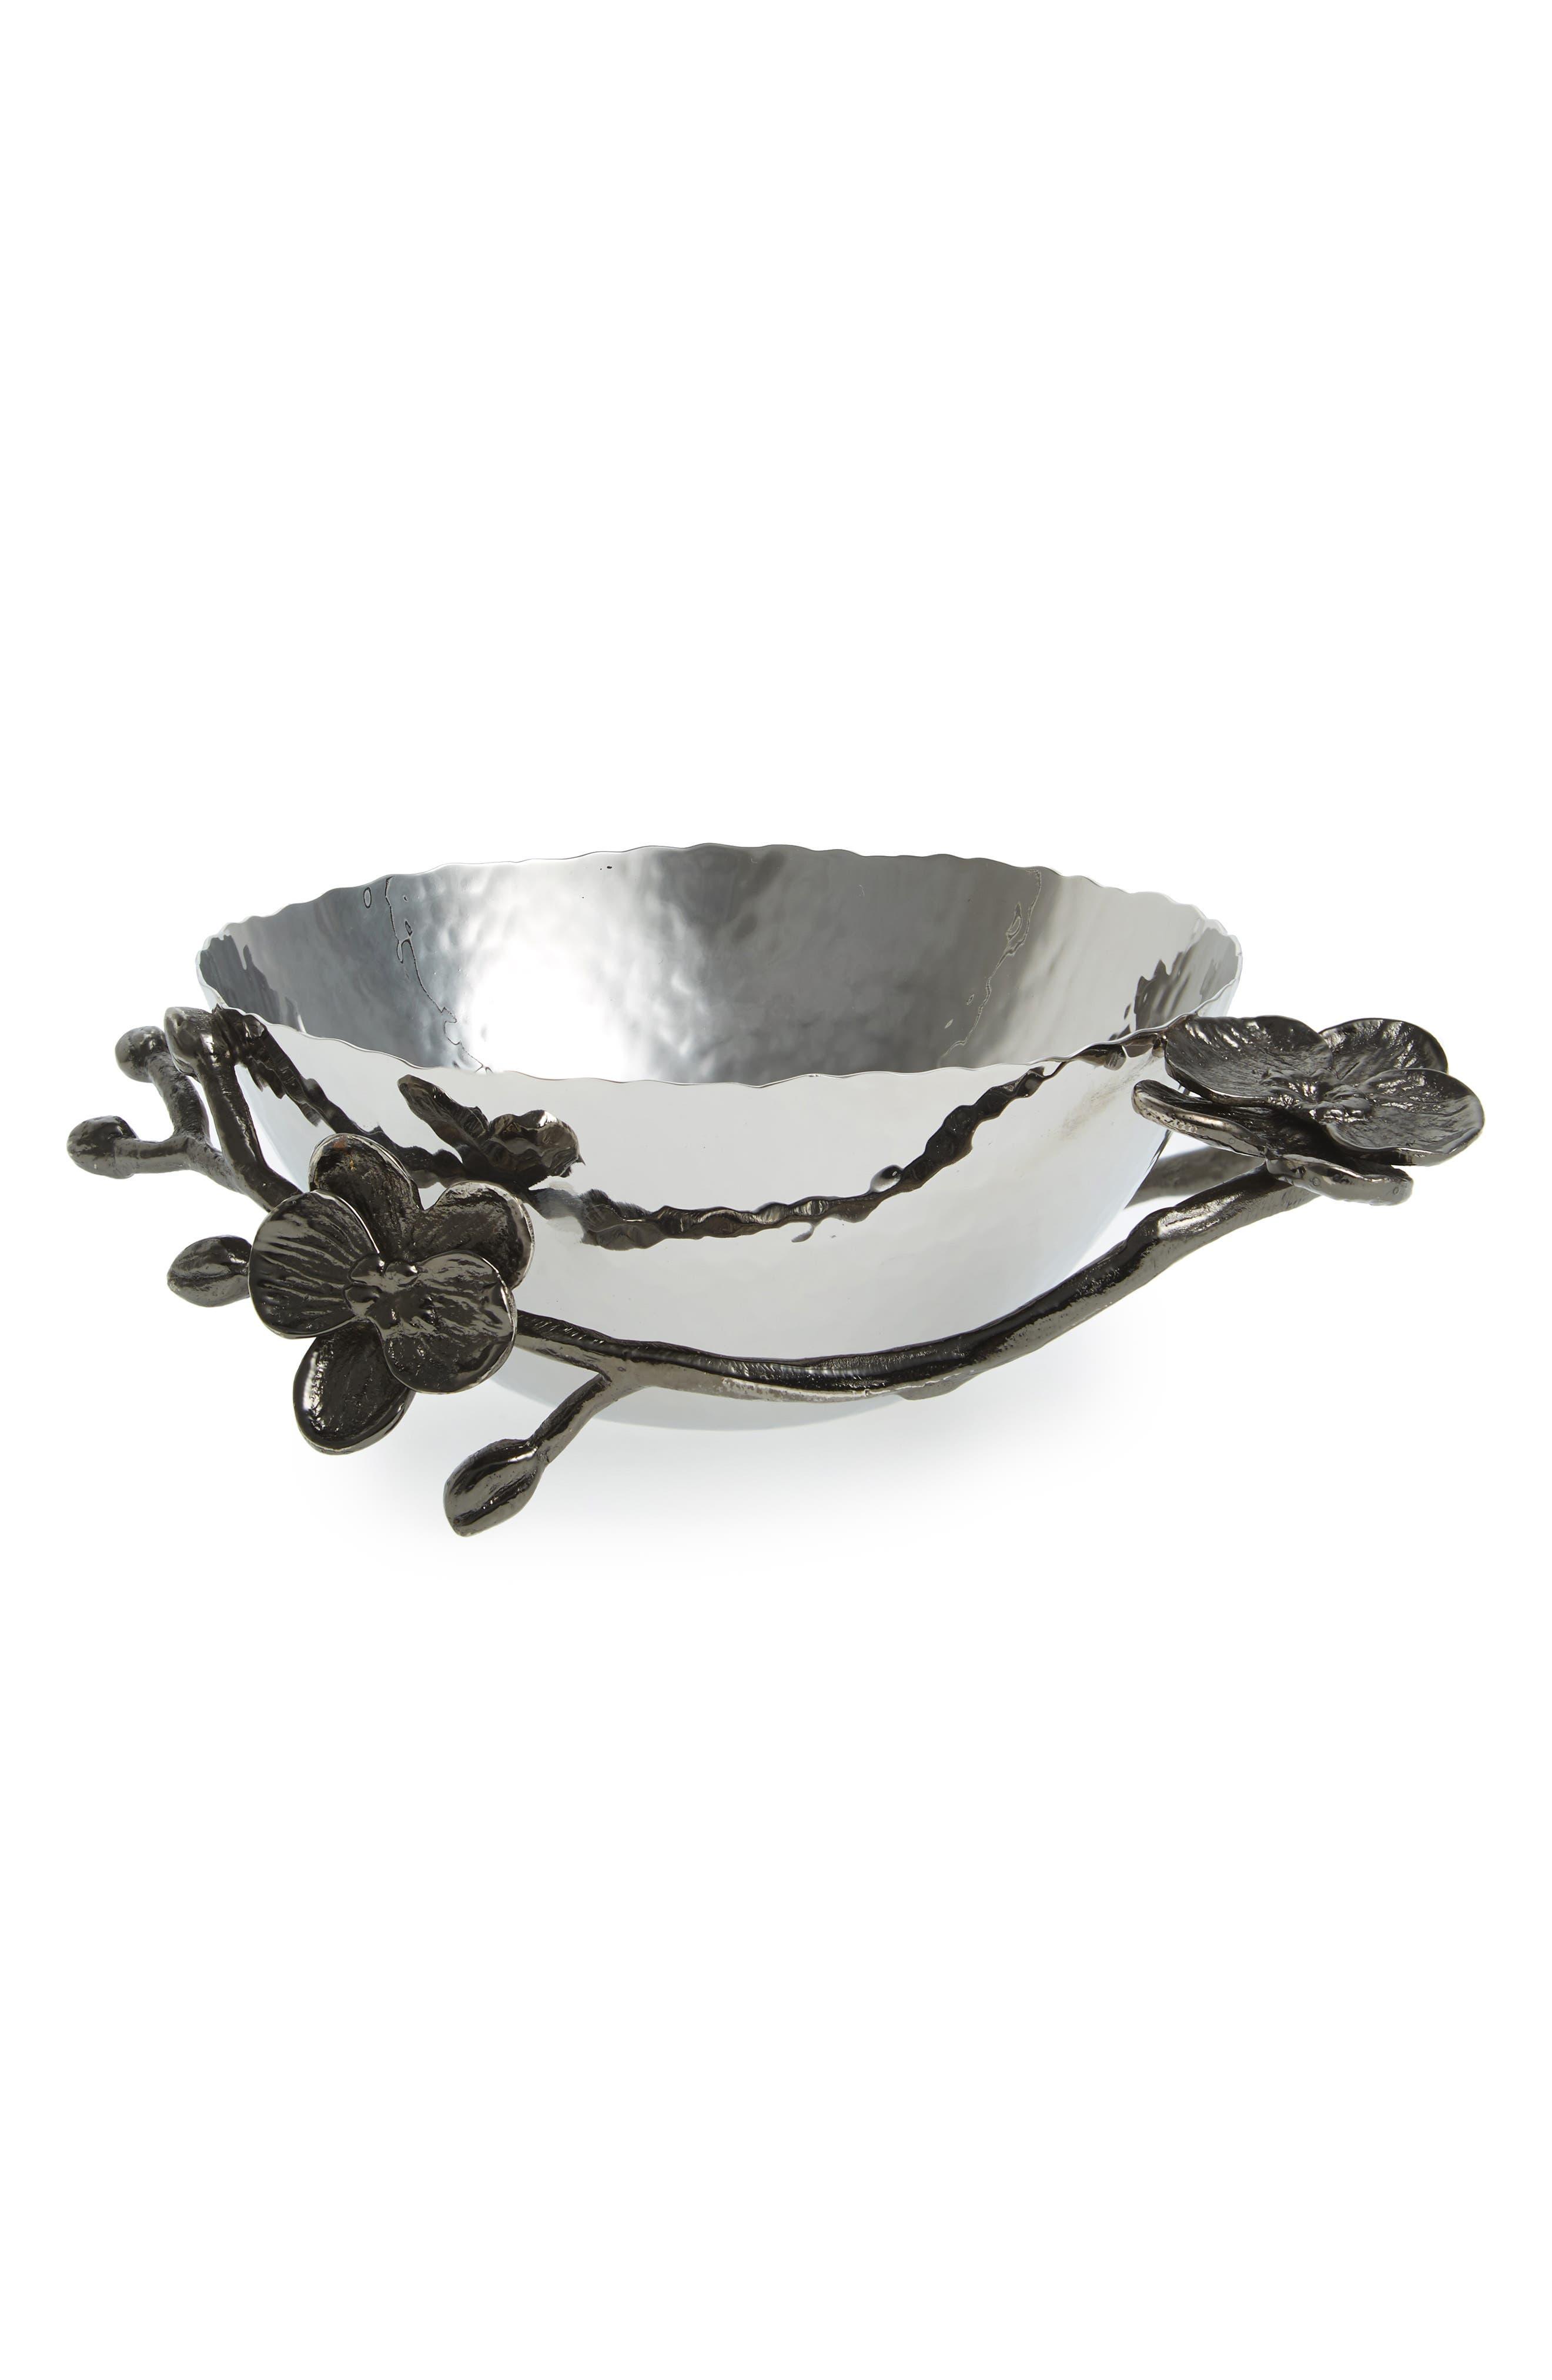 'Black Orchid' Nut Bowl,                         Main,                         color, Black Nickel